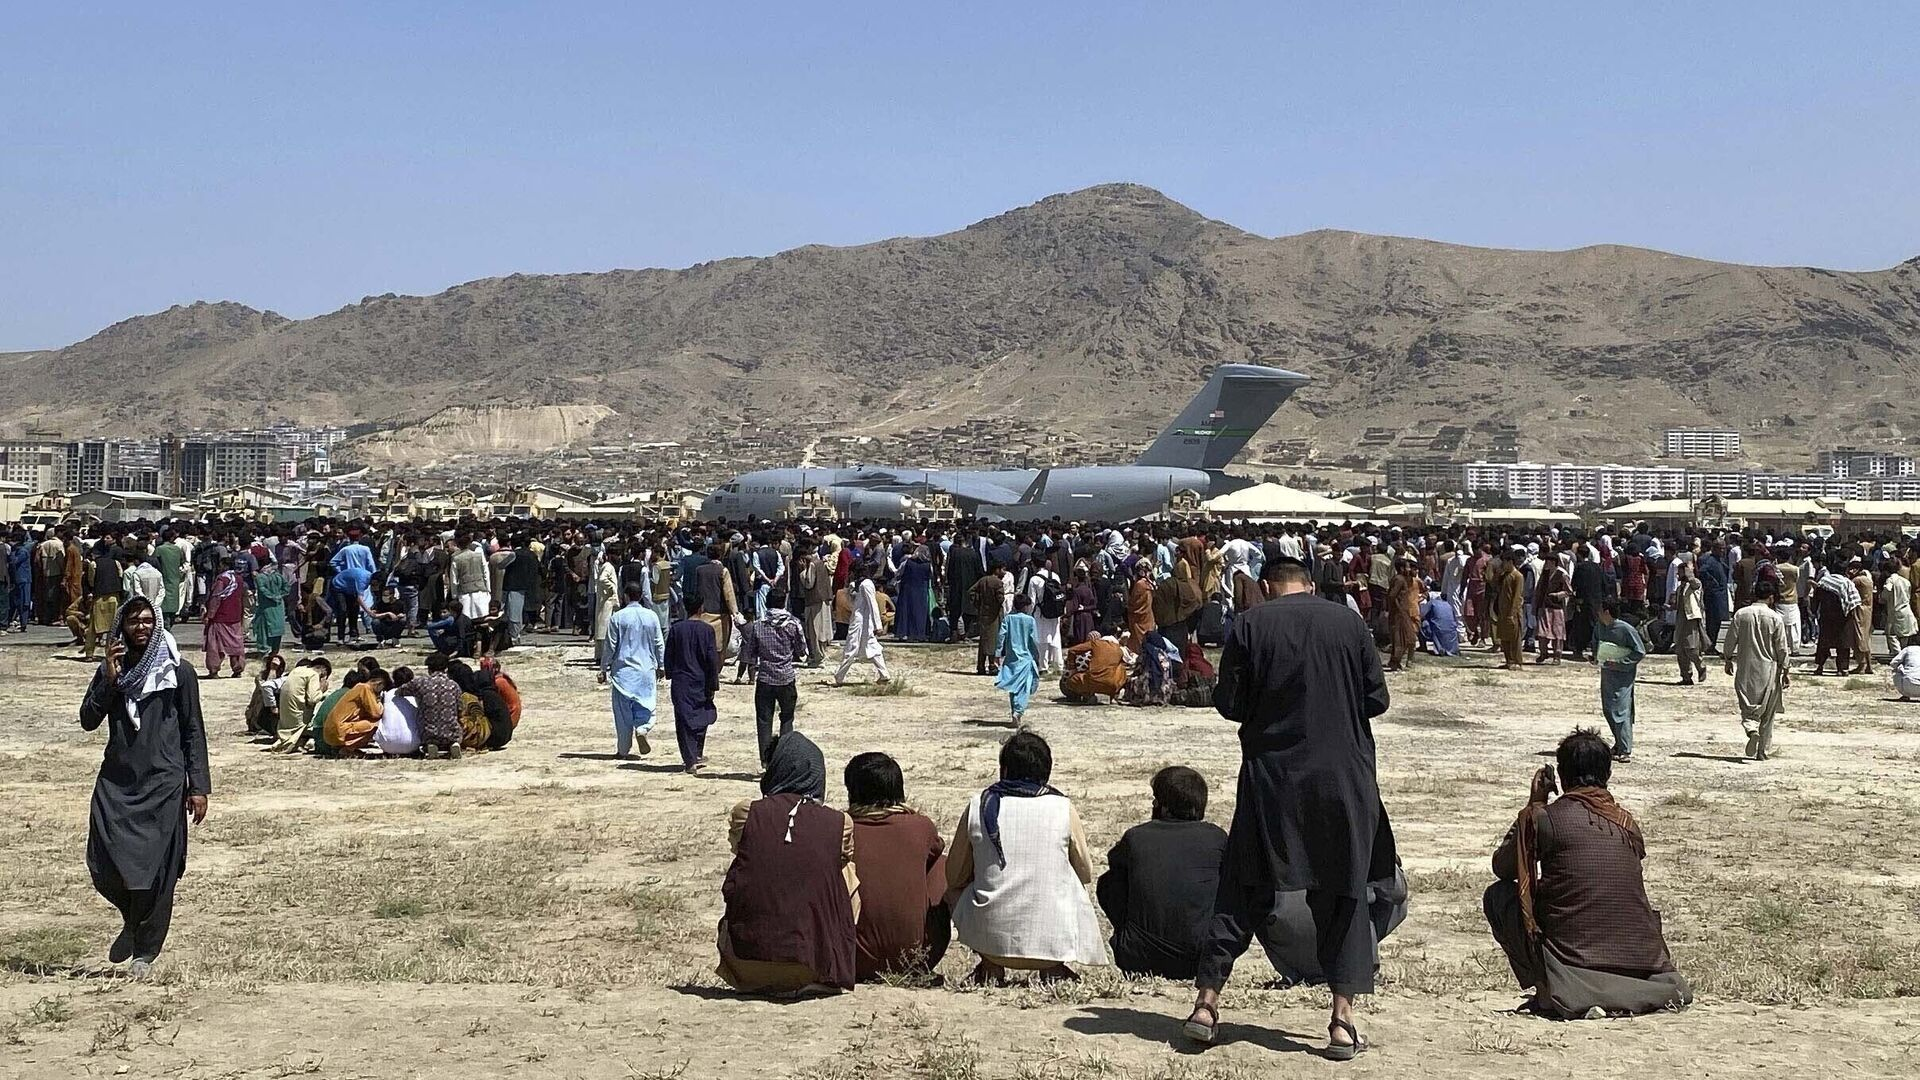 Самолет C-17 в аэропорту Кабула  - Sputnik Узбекистан, 1920, 06.09.2021